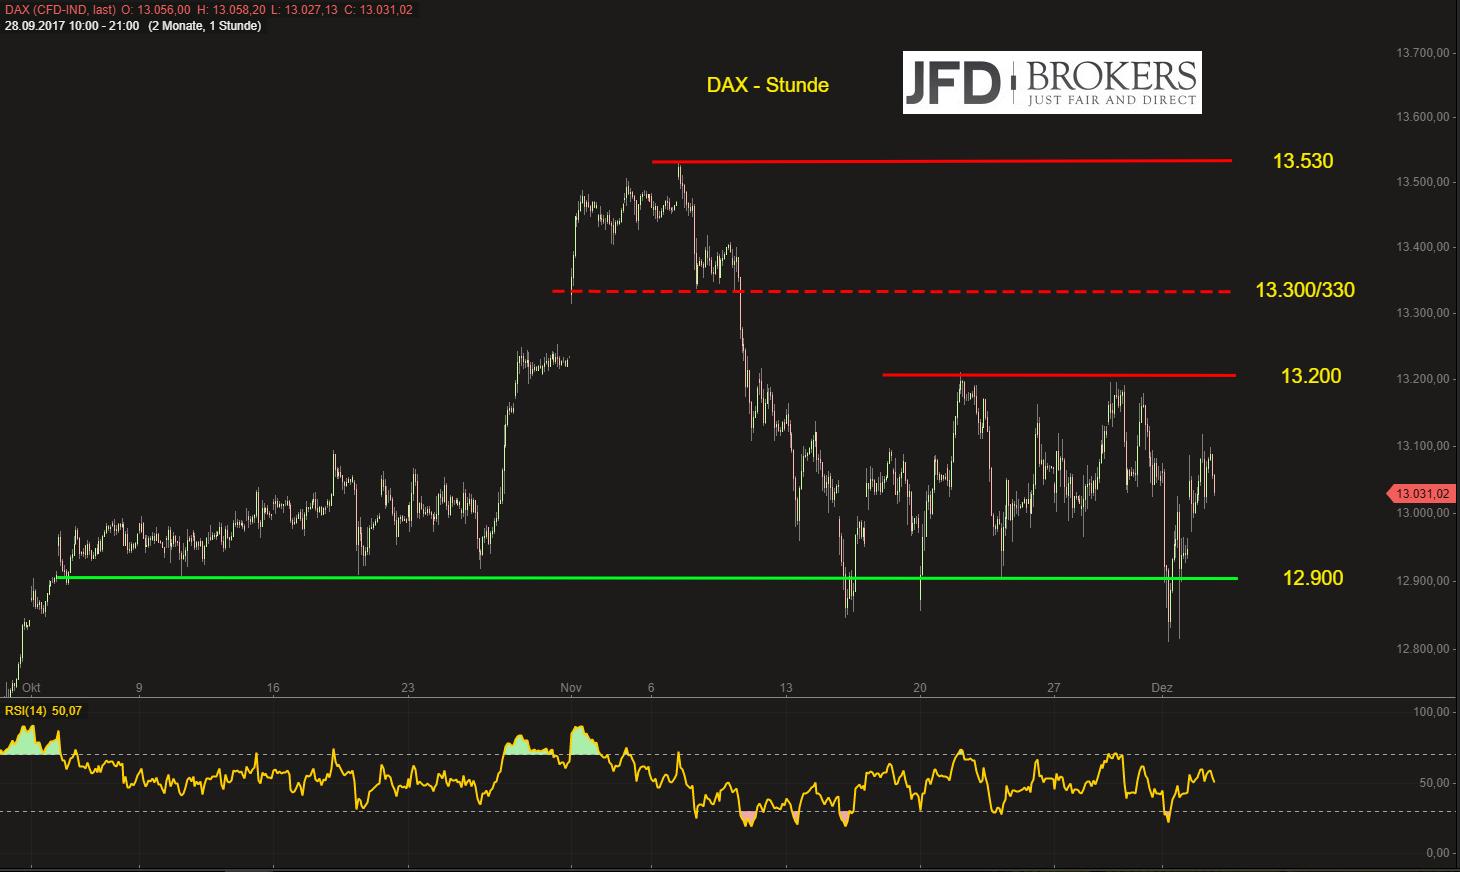 DAX-bleibt-choppy-dennoch-zeitnahe-Attacke-auf-13-200-Kommentar-JFD-Brokers-GodmodeTrader.de-2